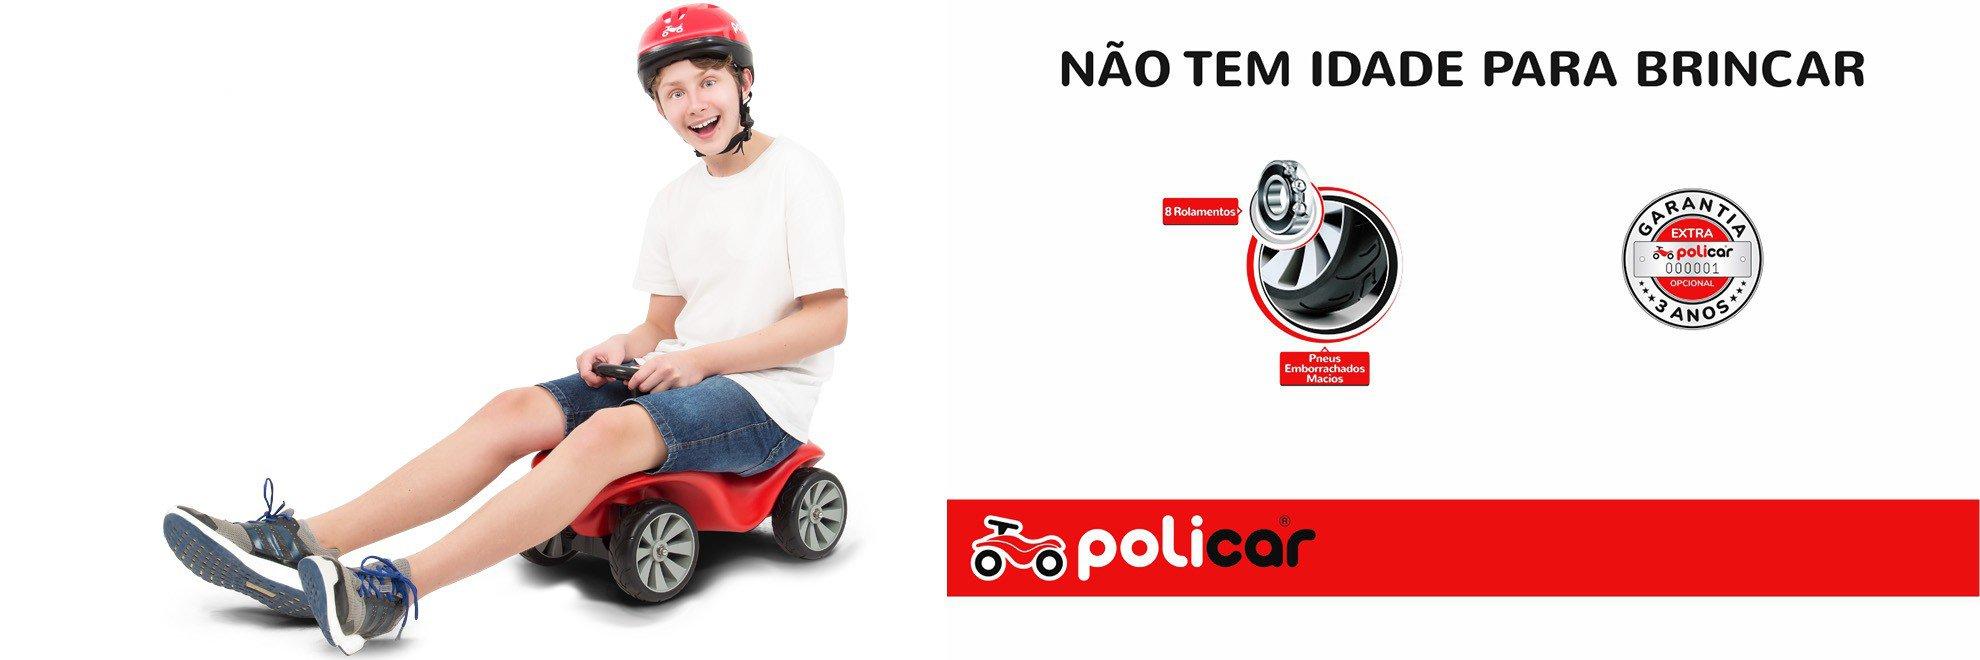 poliplac plataforma banner 7089